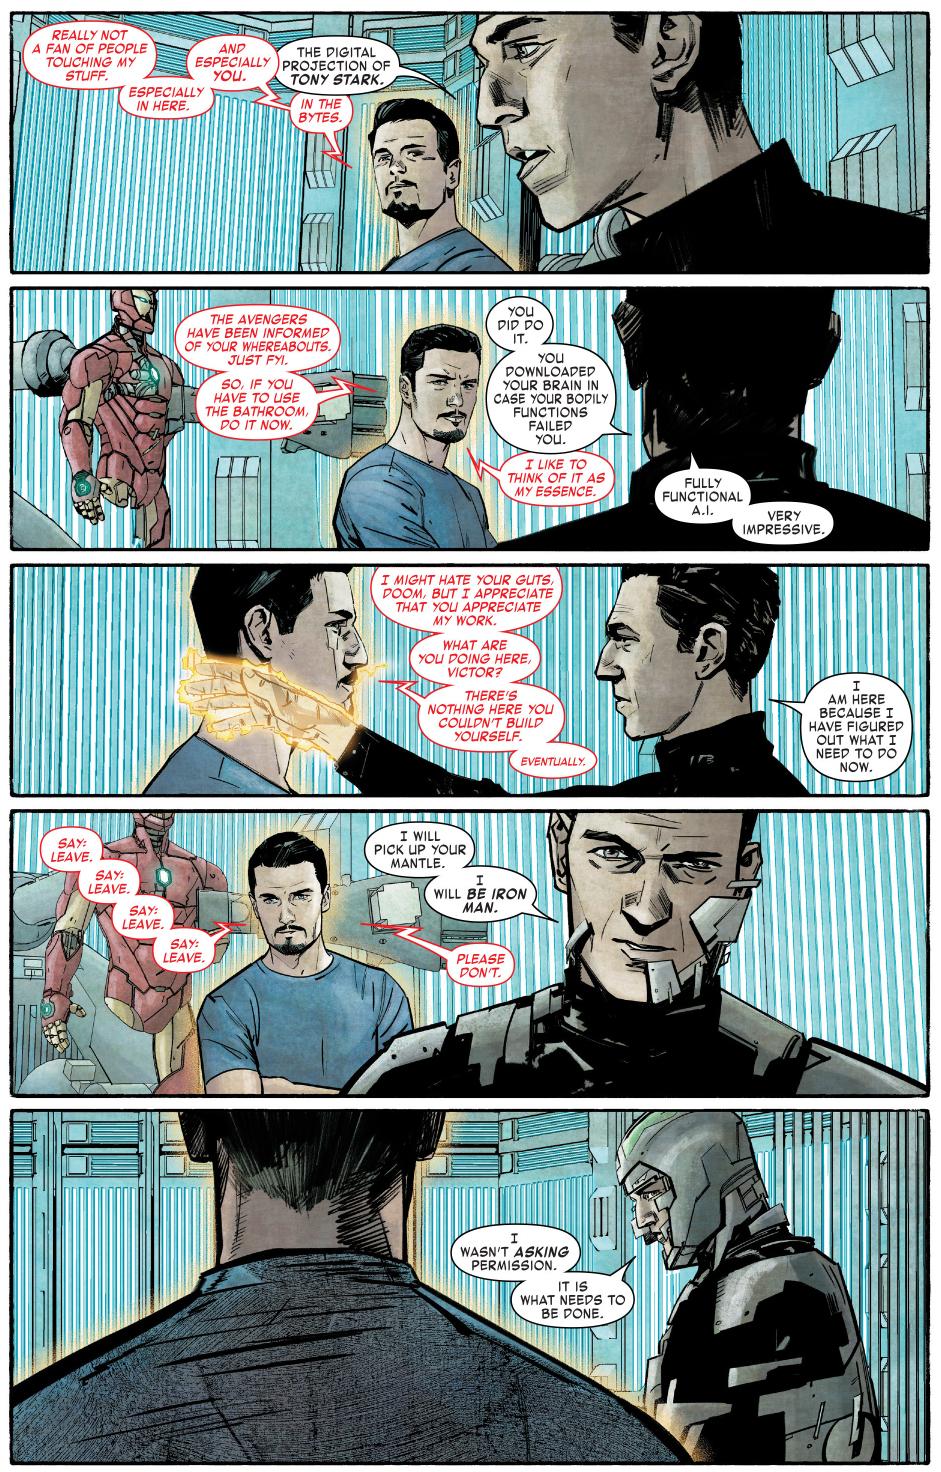 doctor-doom-decides-to-become-iron-man